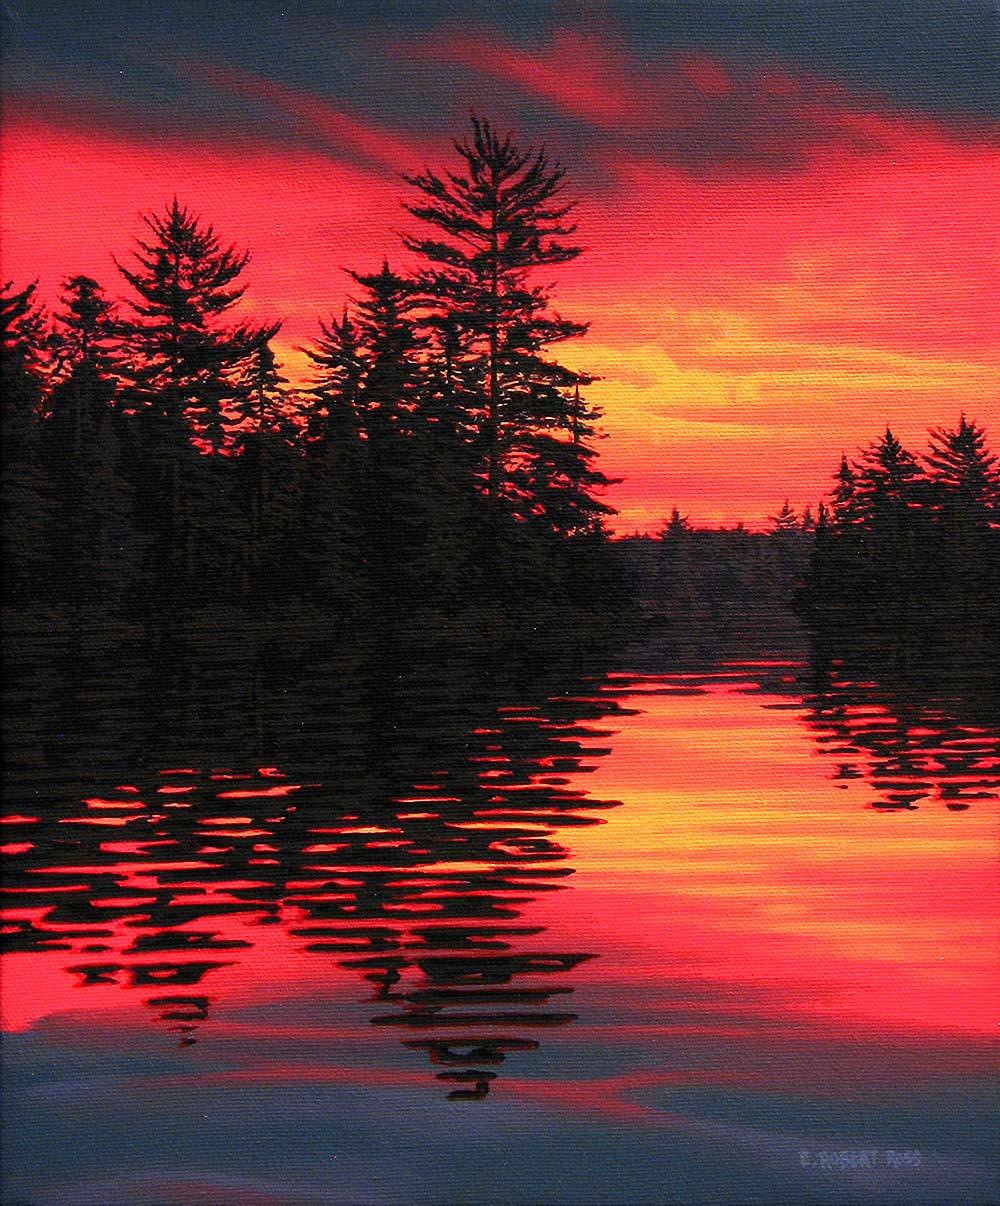 Sunset Cannisbay Lake - Robert Ross